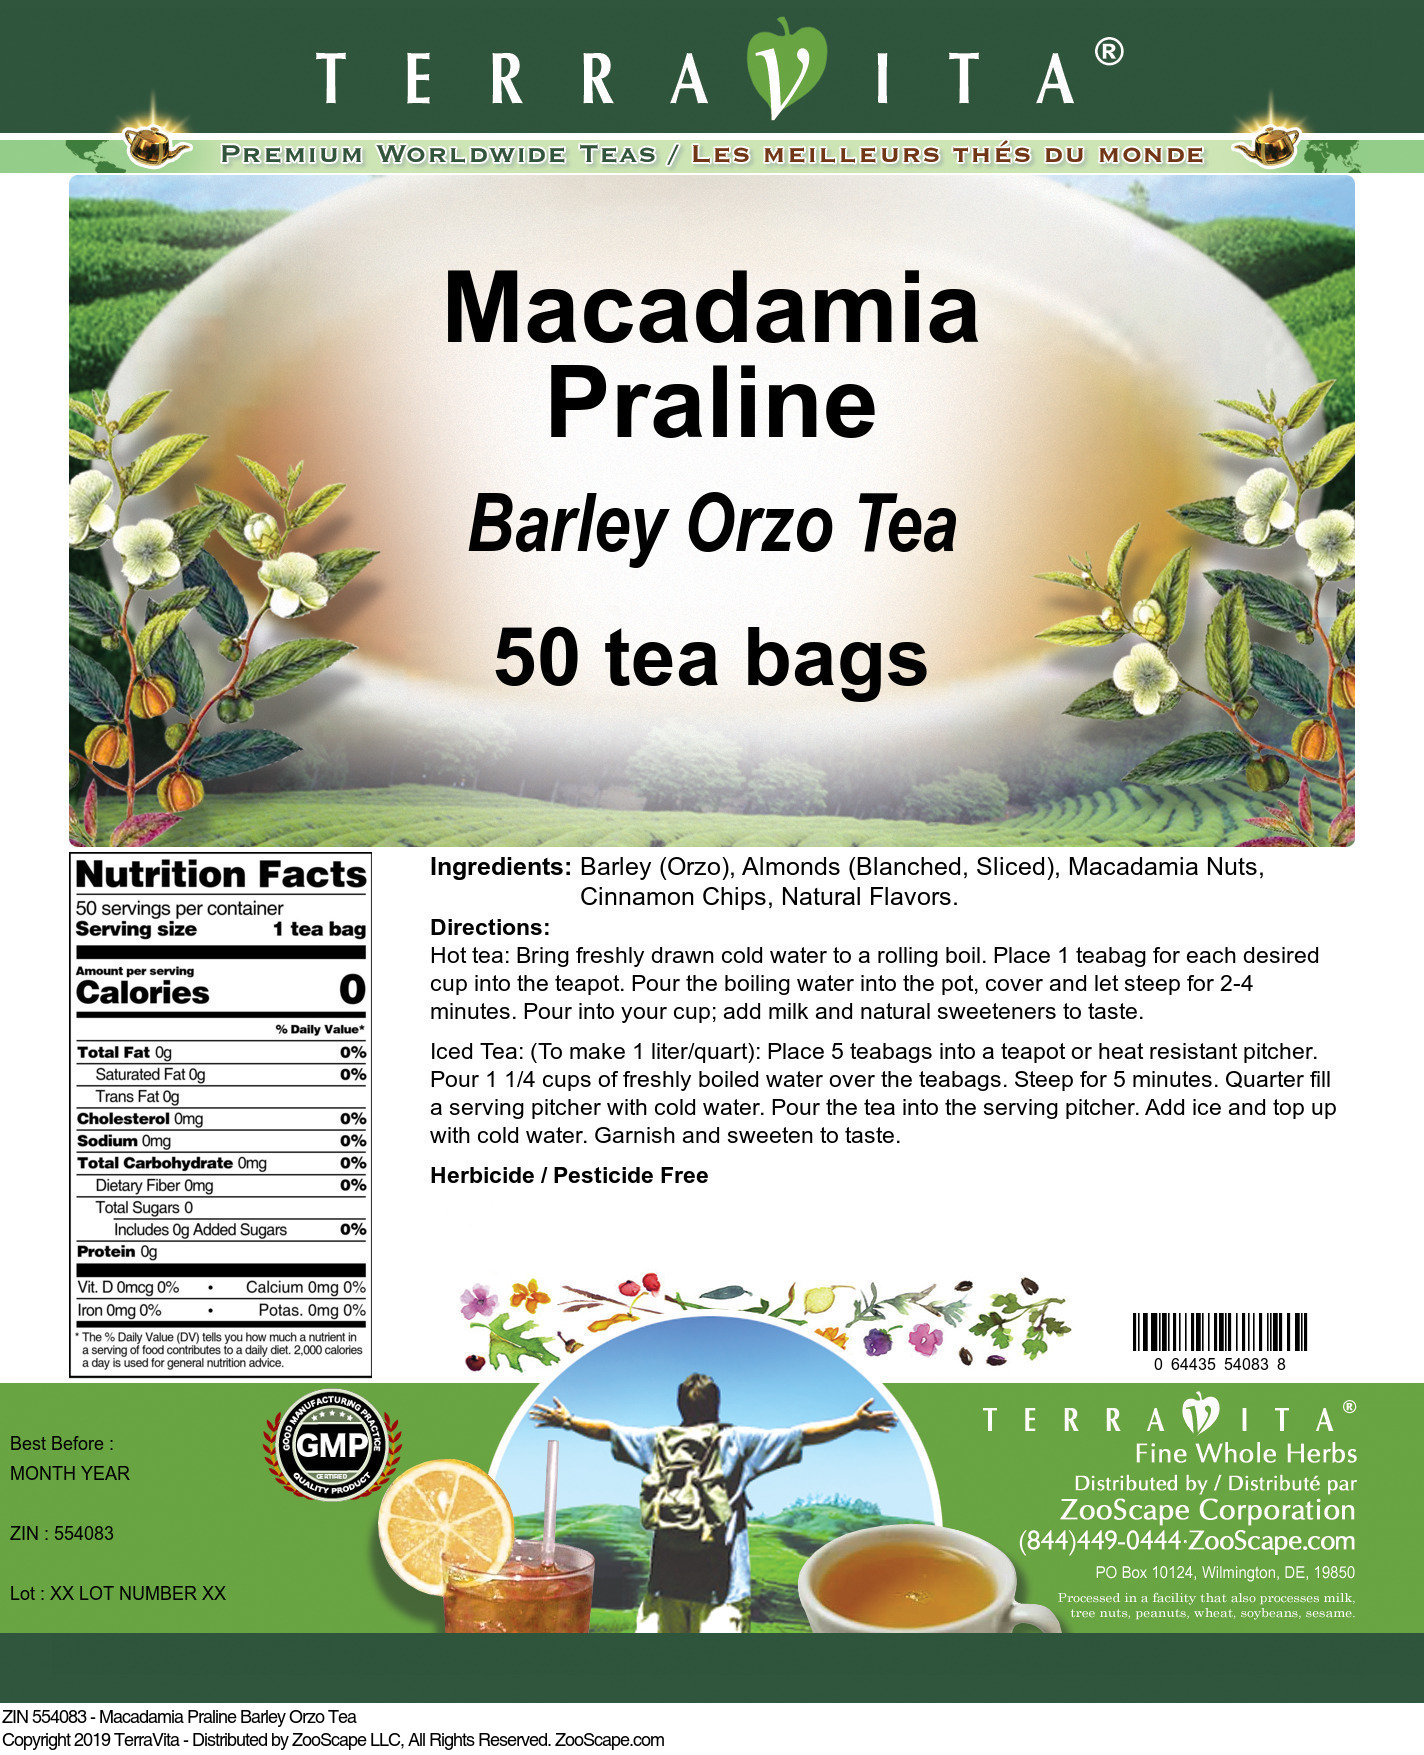 Macadamia Praline Barley Orzo